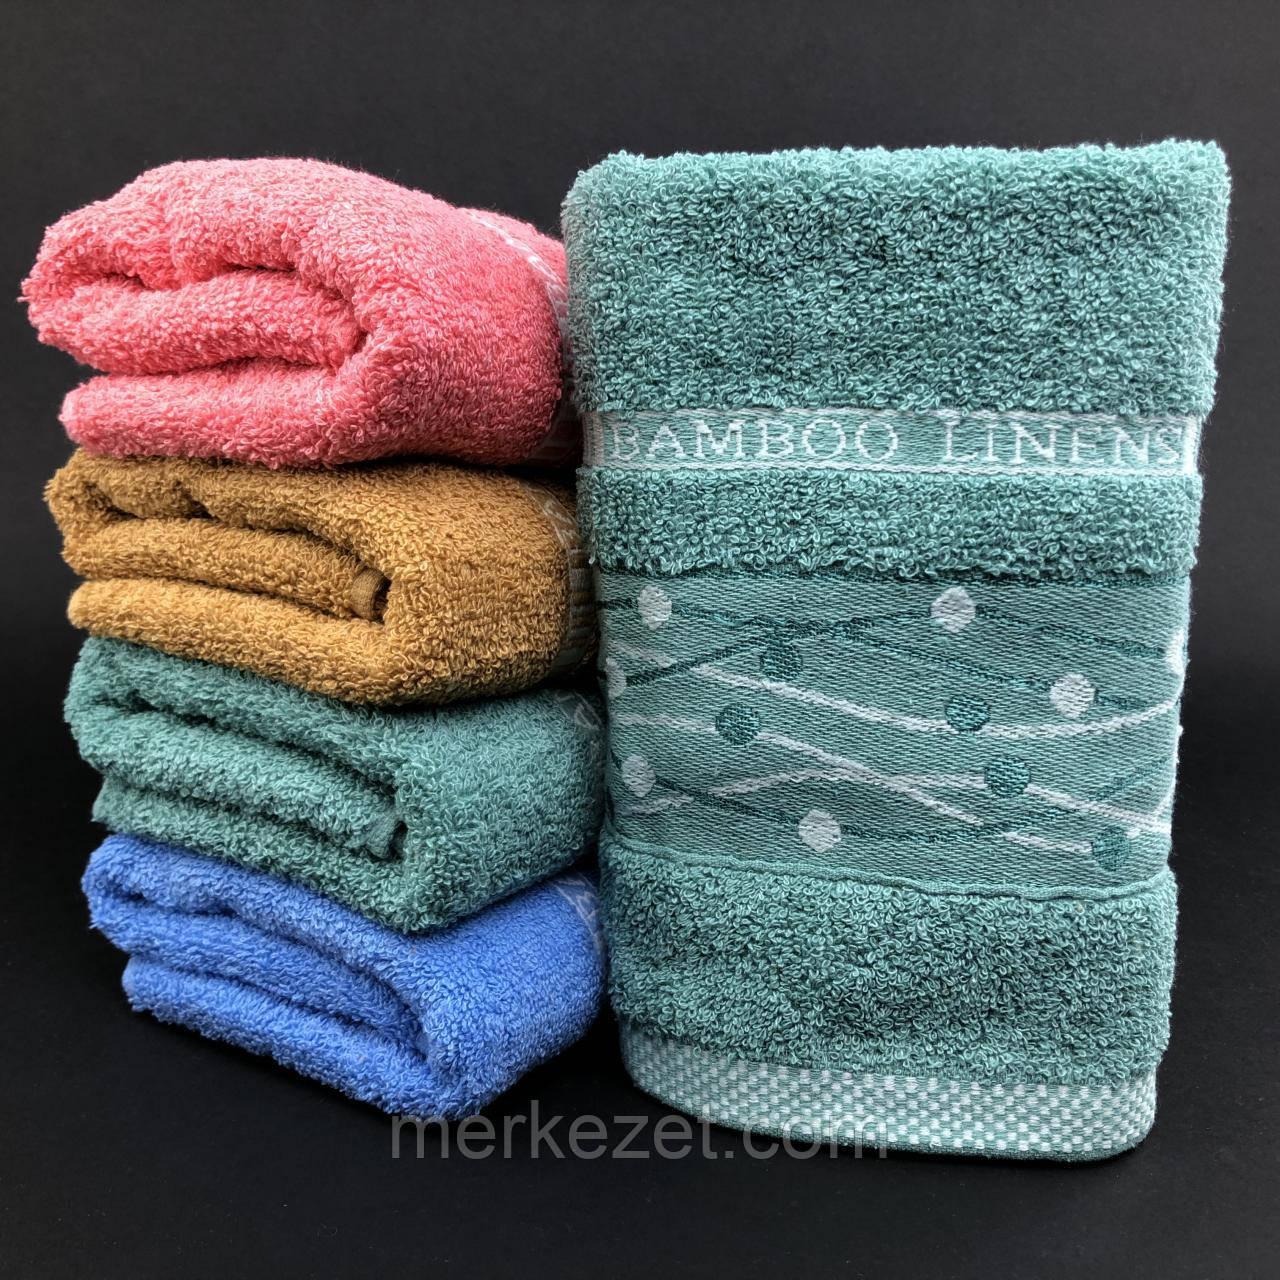 "Полотенце для бани. Махровое полотенце ""Джейси"". Полотенца оптом и розница"